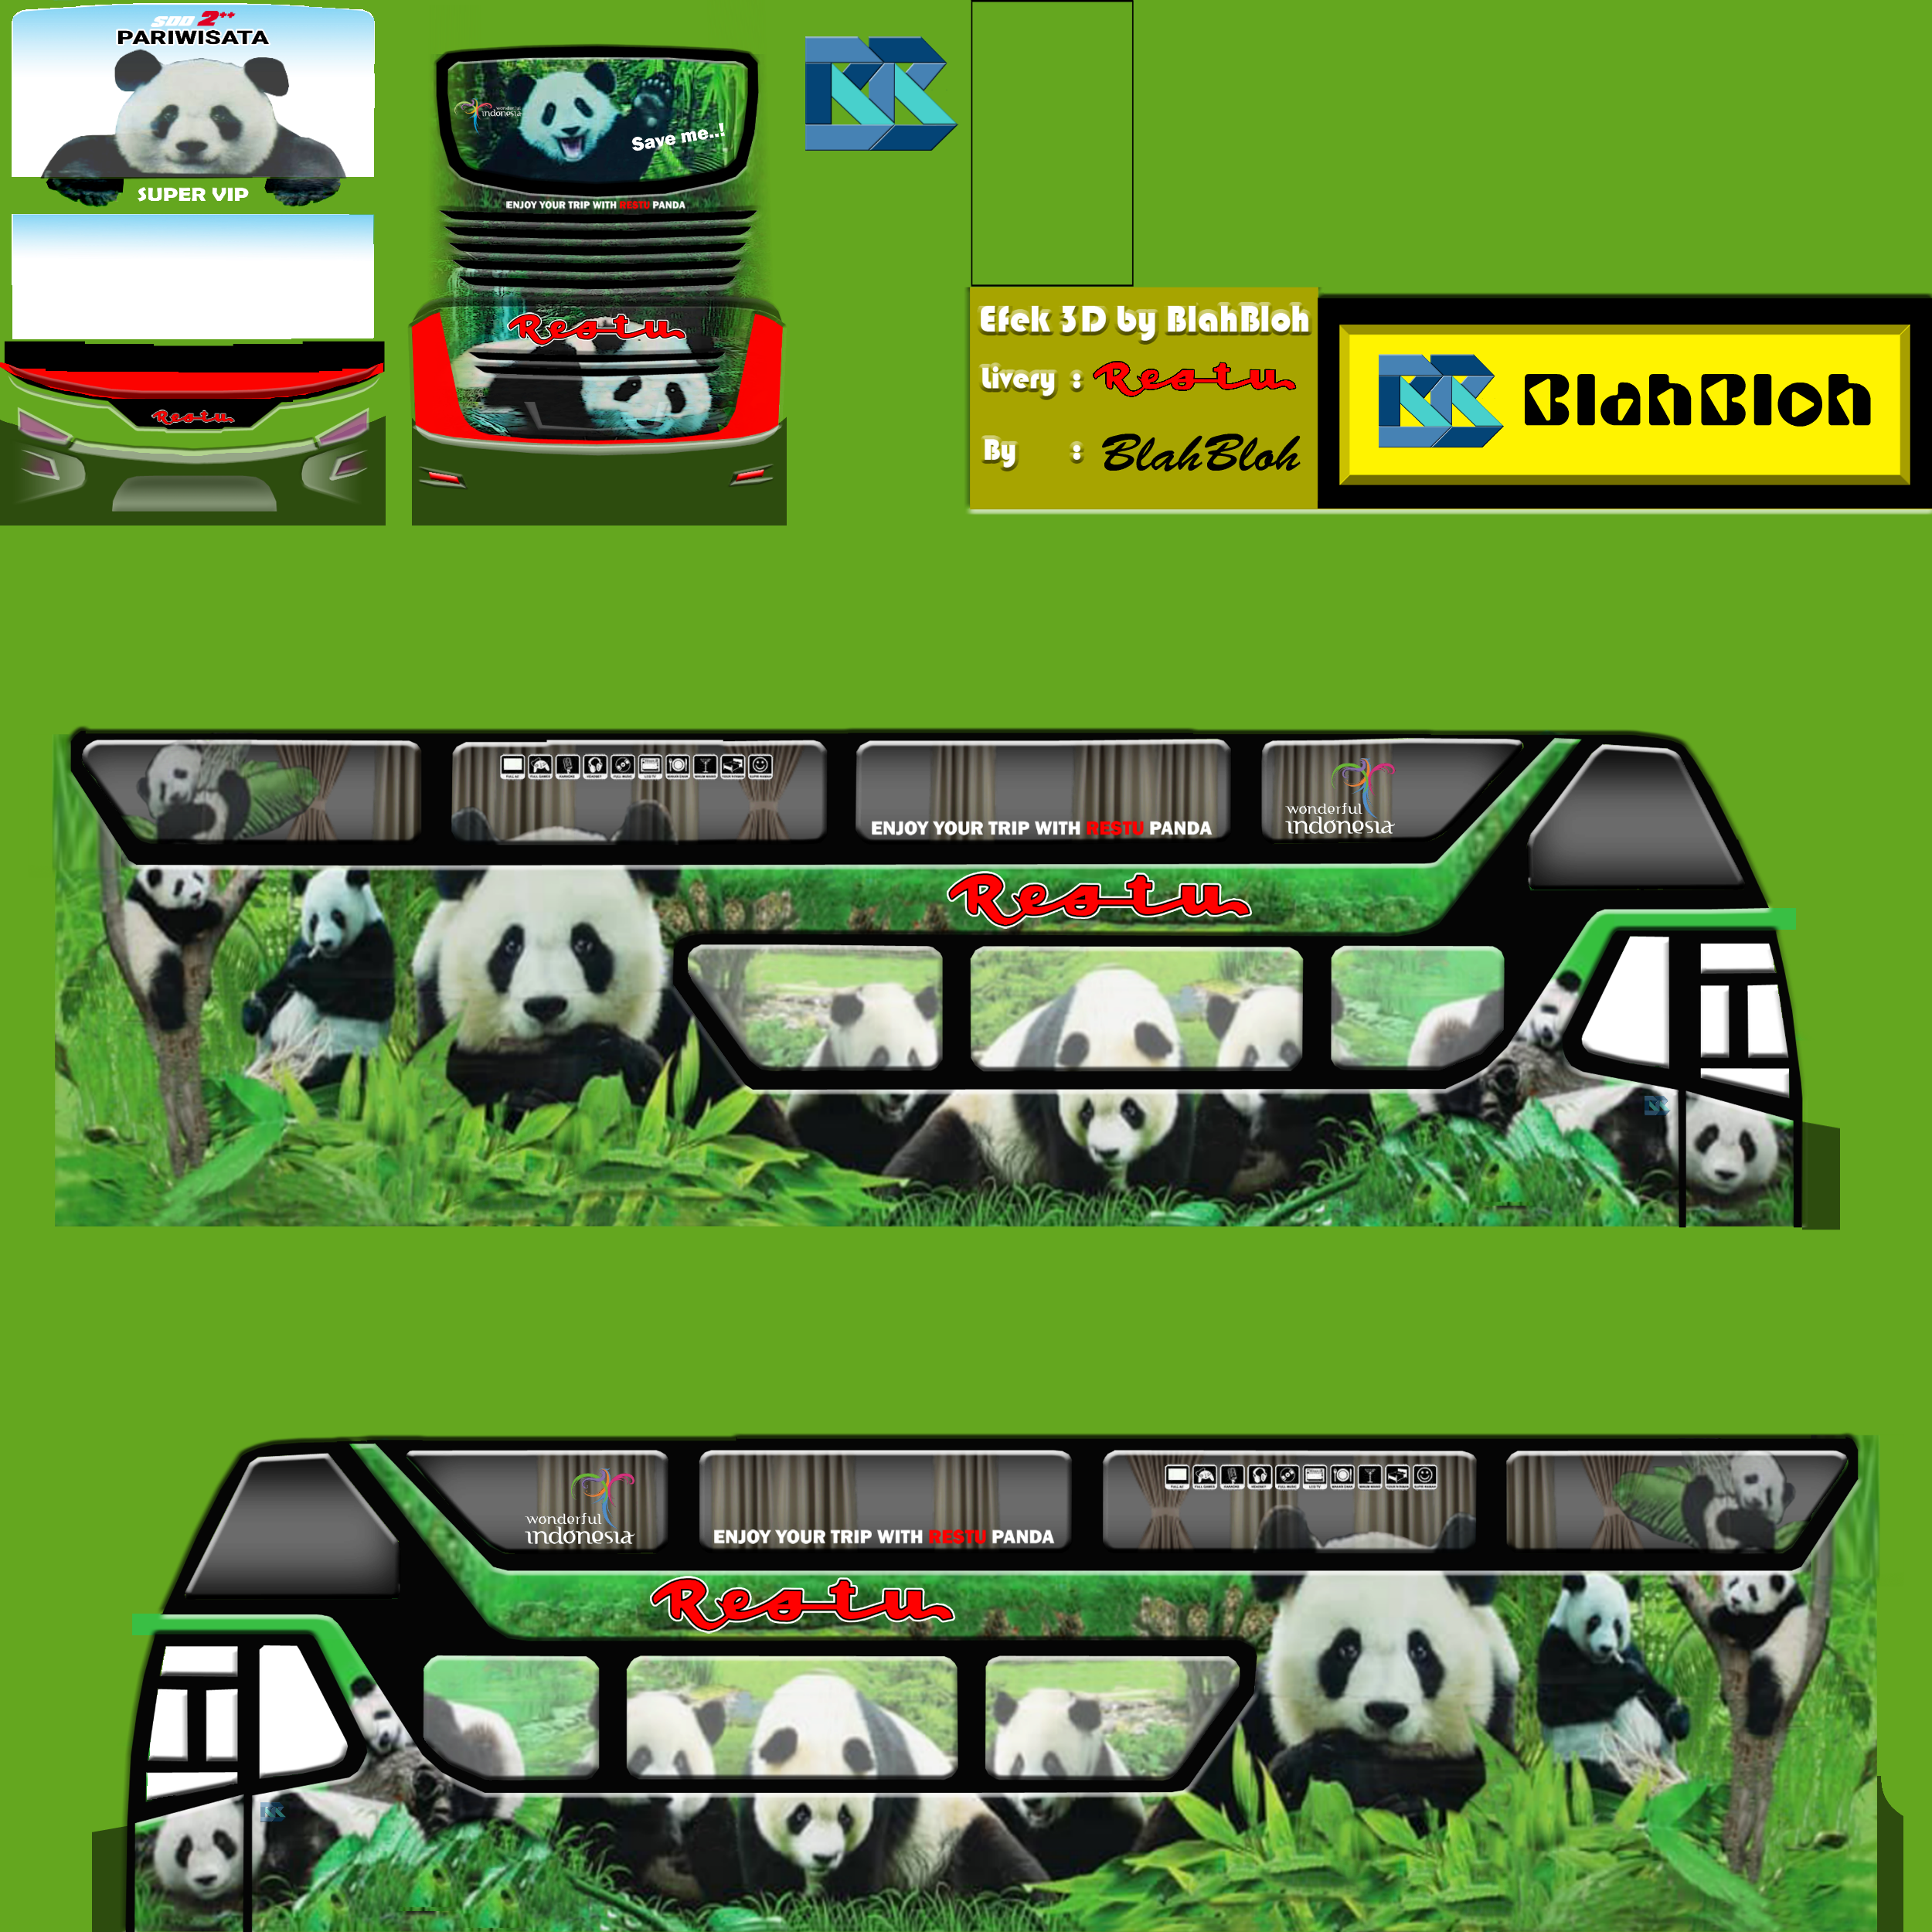 30 Livery Bussid Bimasena Sdd Terbaru Kualitas Jernih Png Konsep Mobil Mobil Futuristik Truk Besar